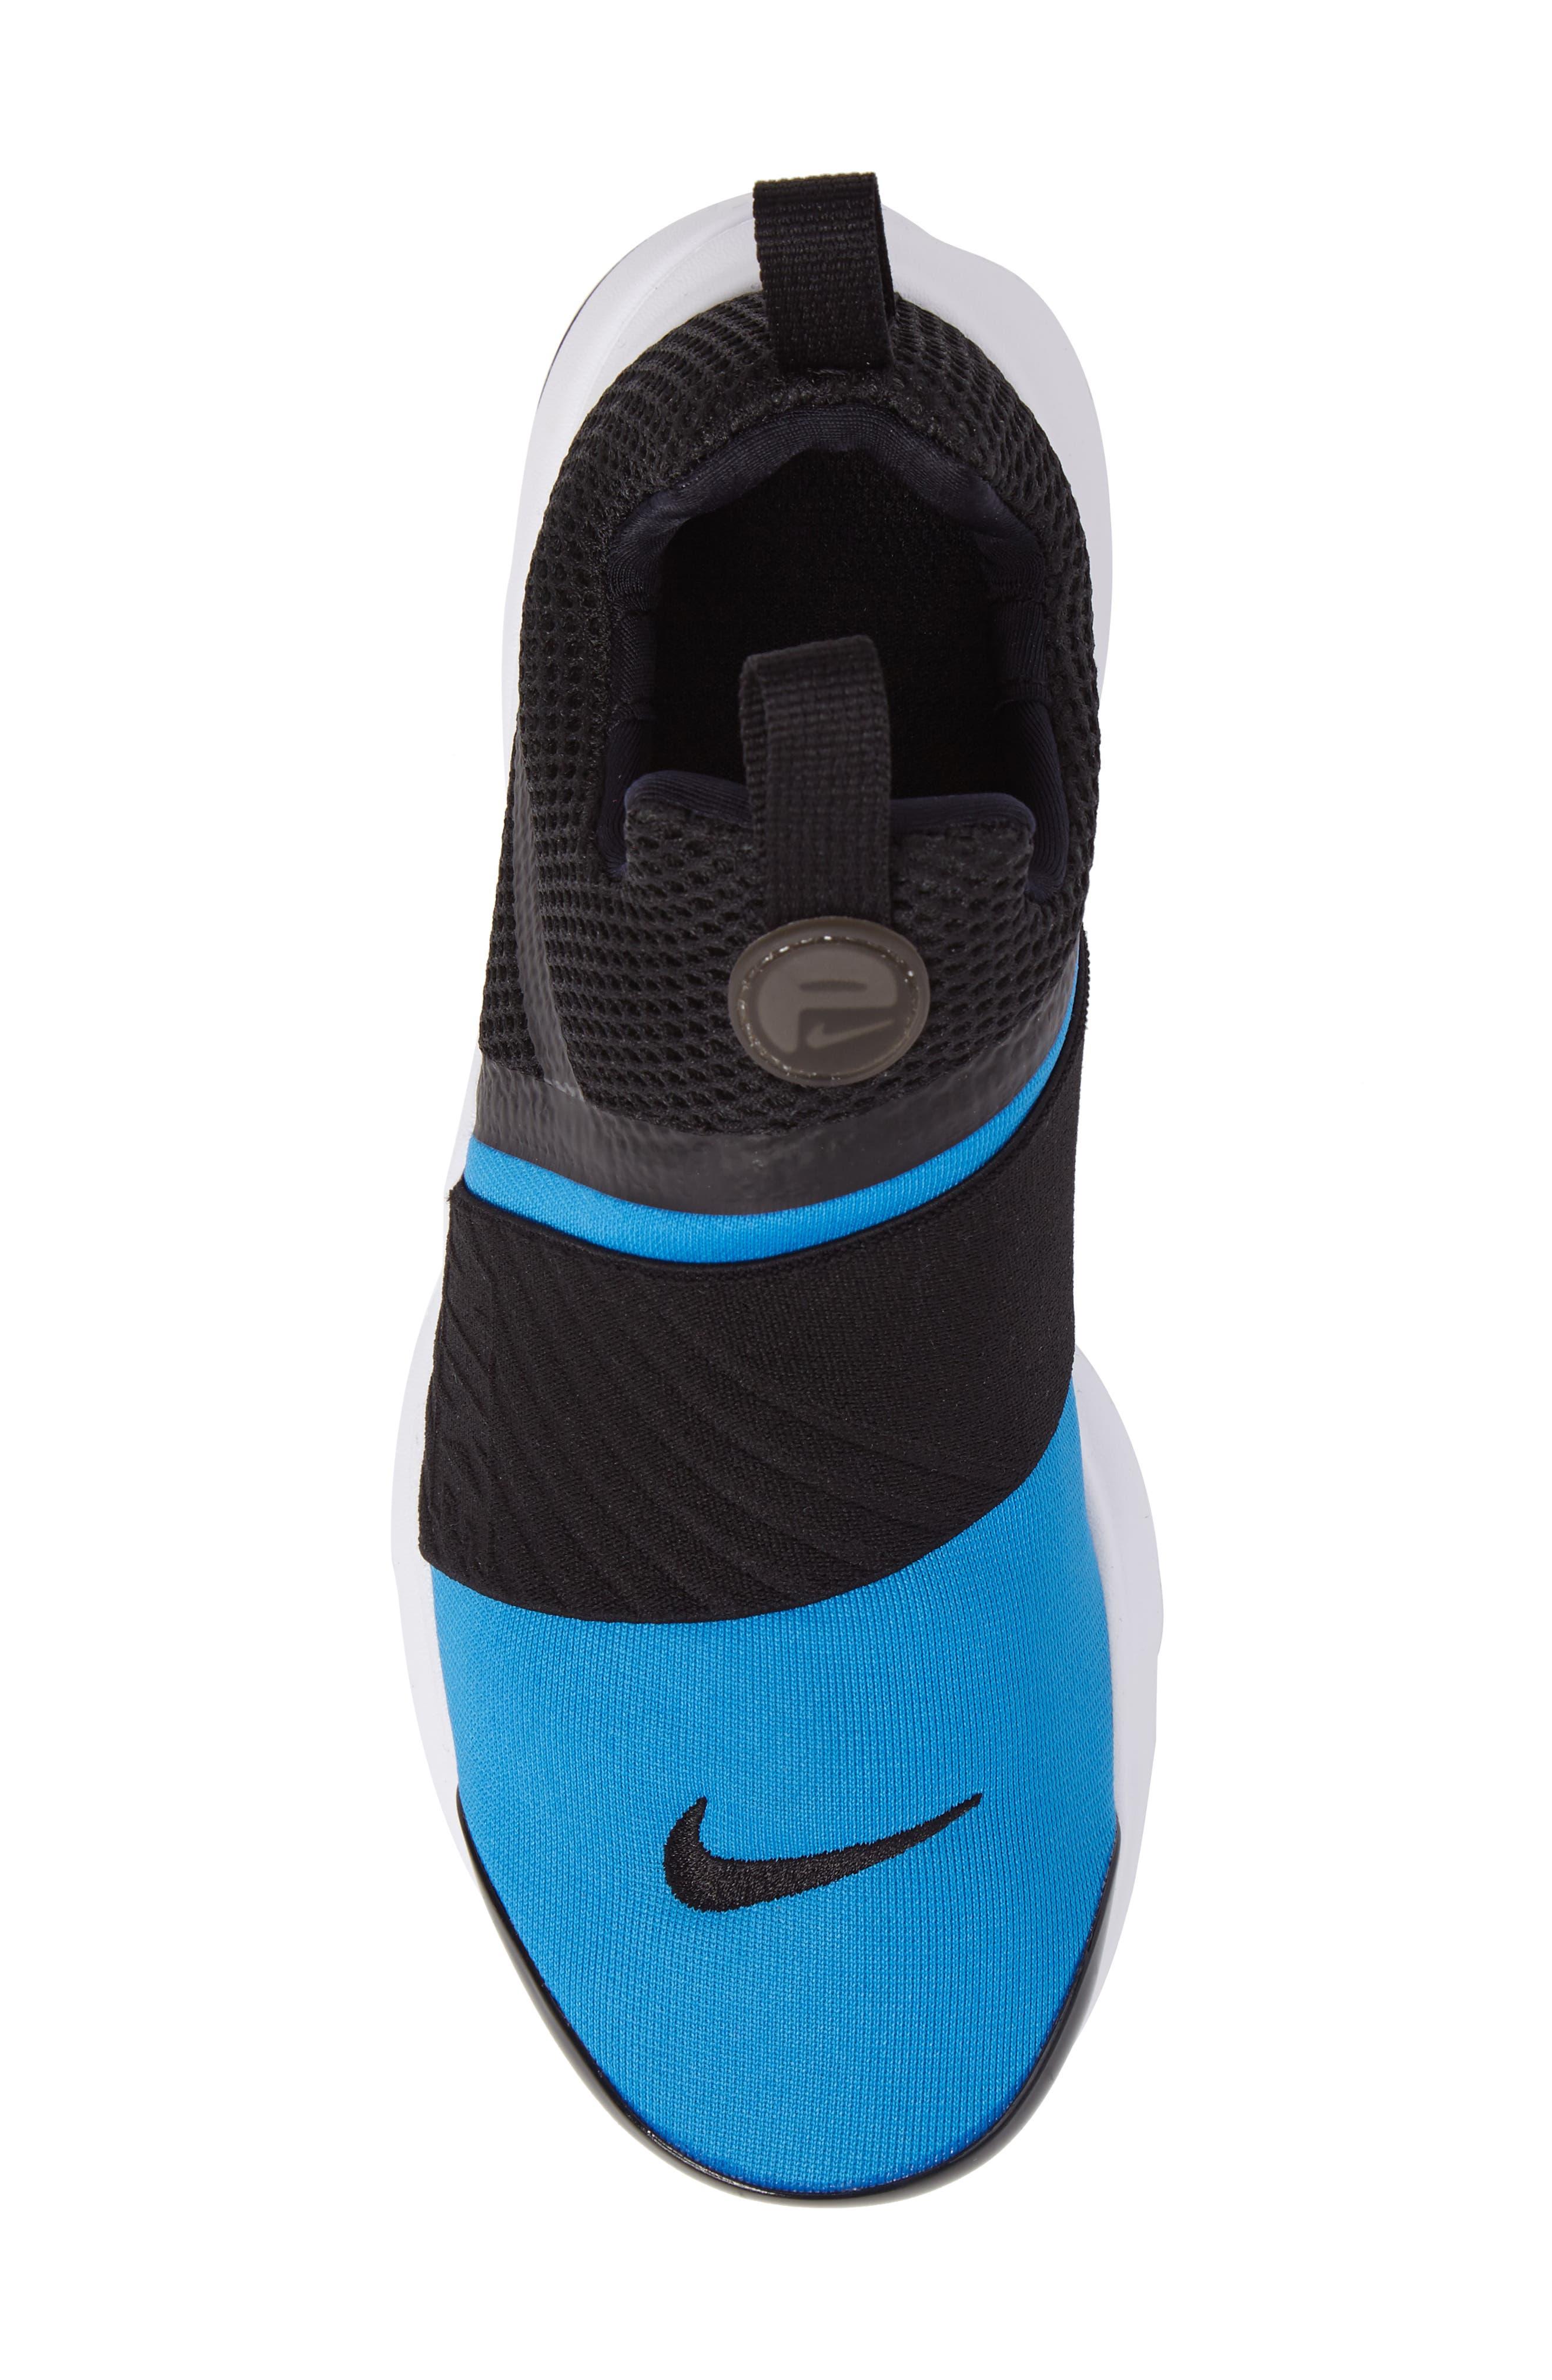 Presto Extreme Sneaker,                             Alternate thumbnail 54, color,